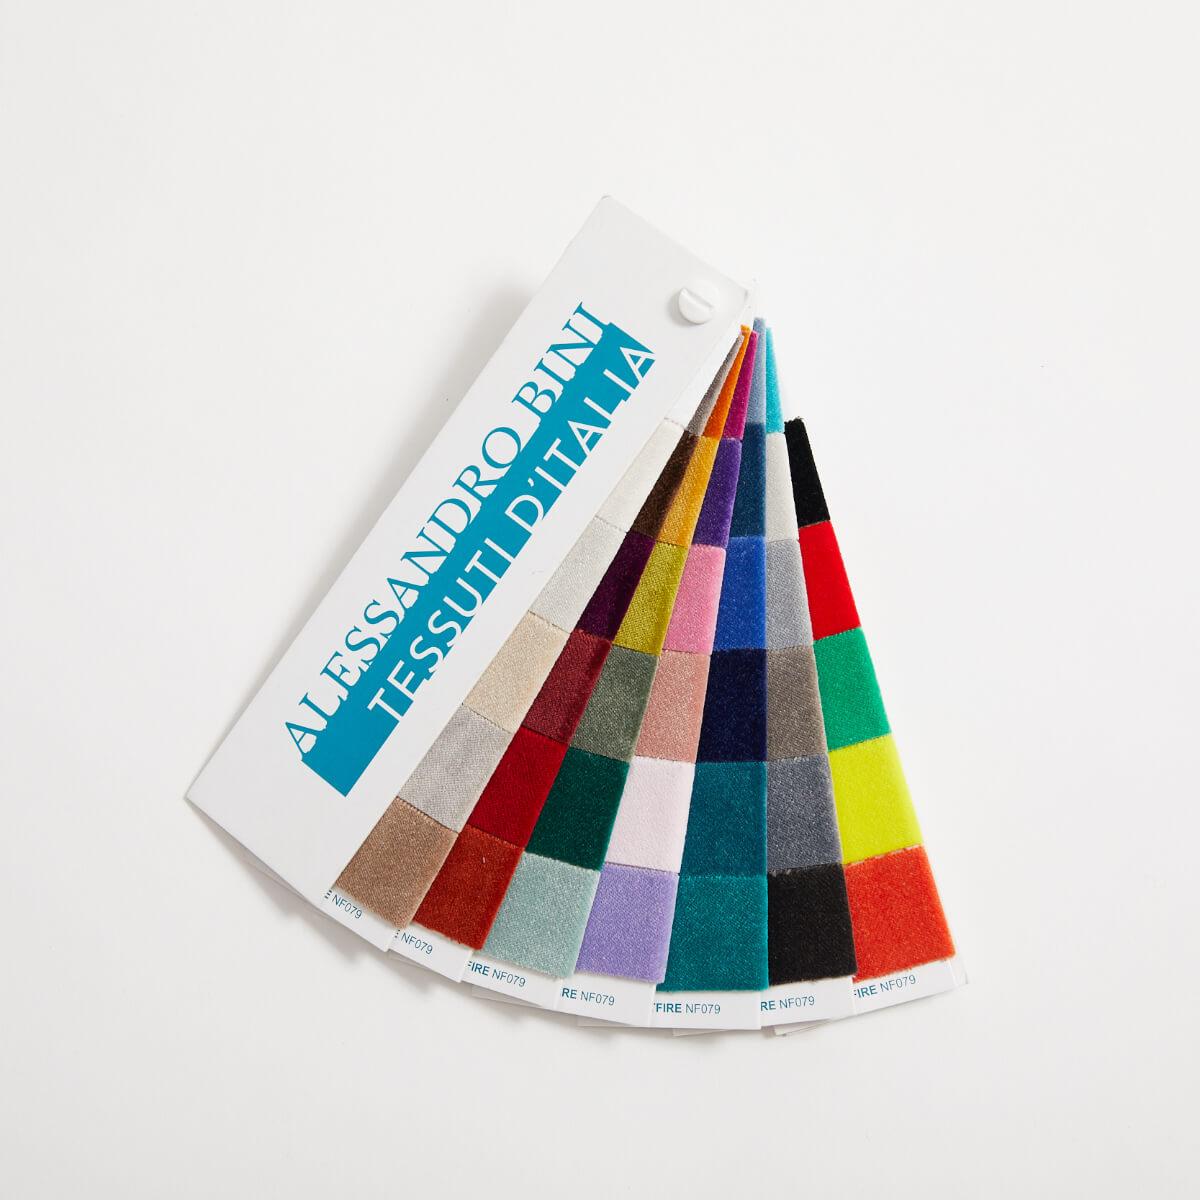 Campionario Spitfire – Palette